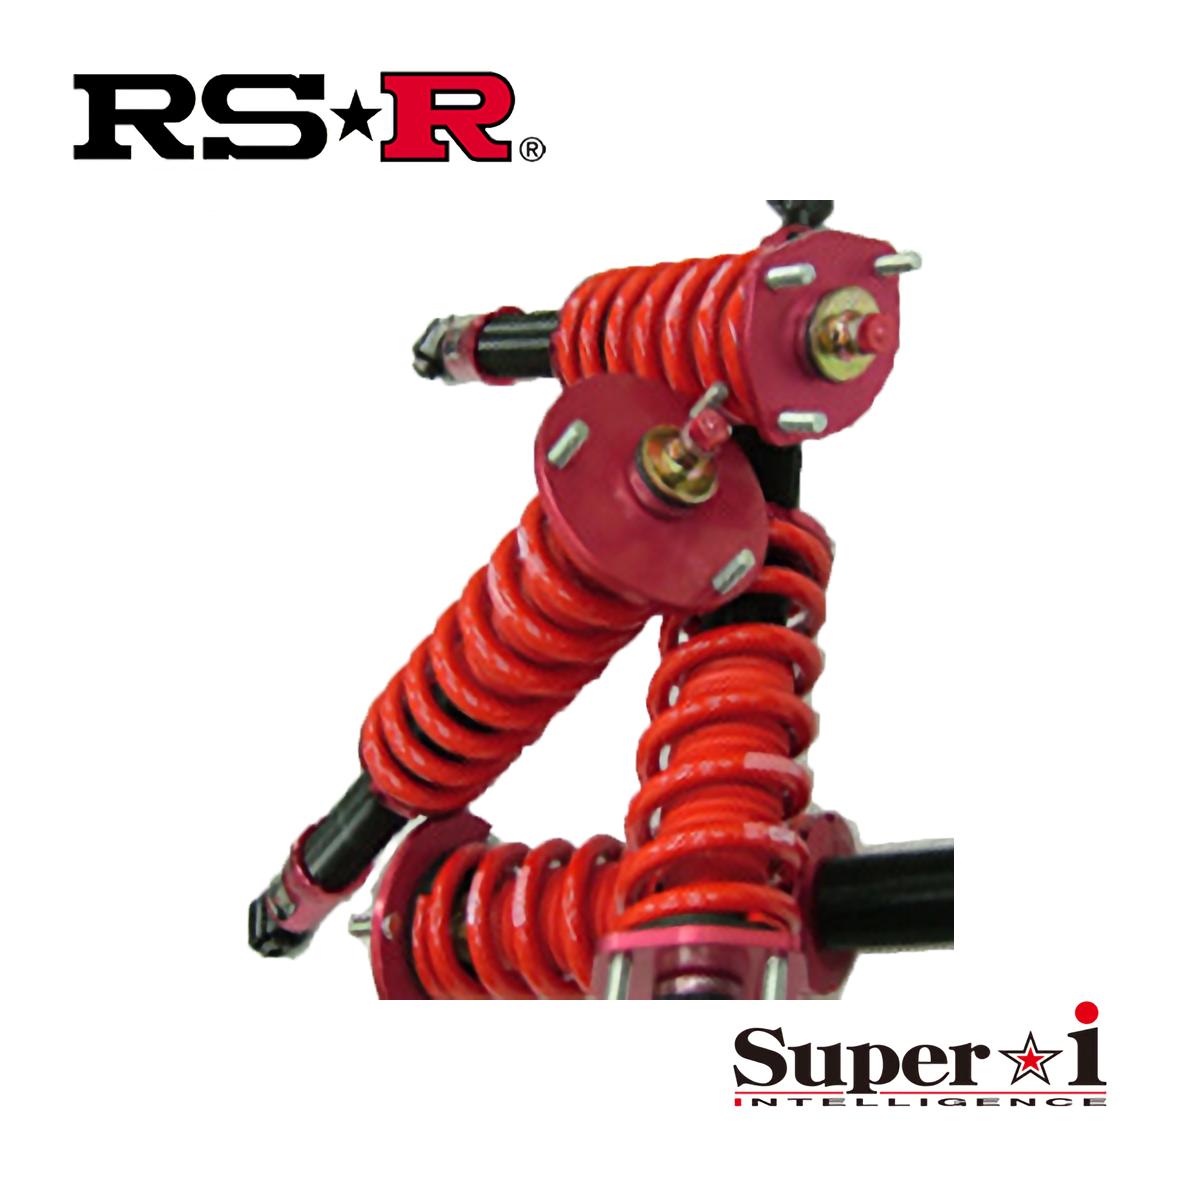 RS-R クラウンハイブリッド AZSH20 RSアドバンス 車高調 リア車高調整:ネジ式/推奨バネレート仕様 SIT967M スーパーi RSR 個人宅発送追金有